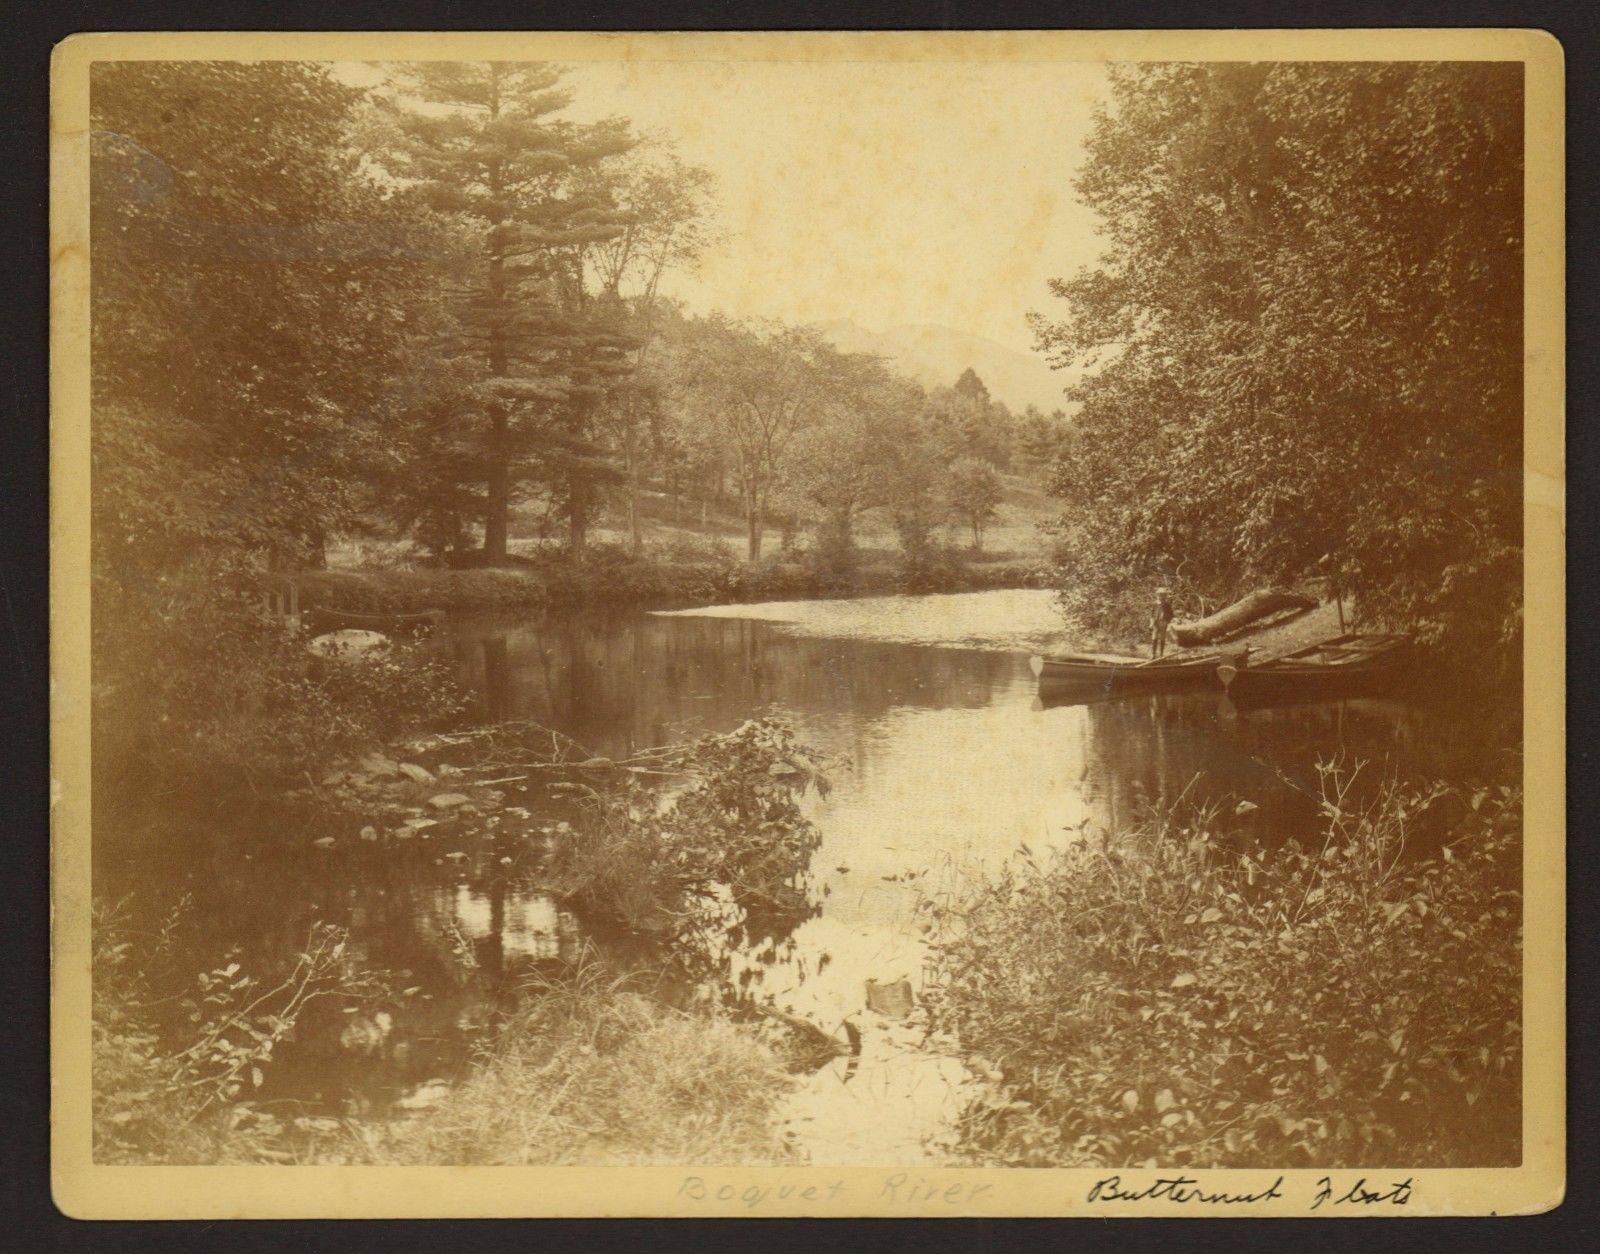 Butternut Flats on the Boquet River (Source: vintage postcard)